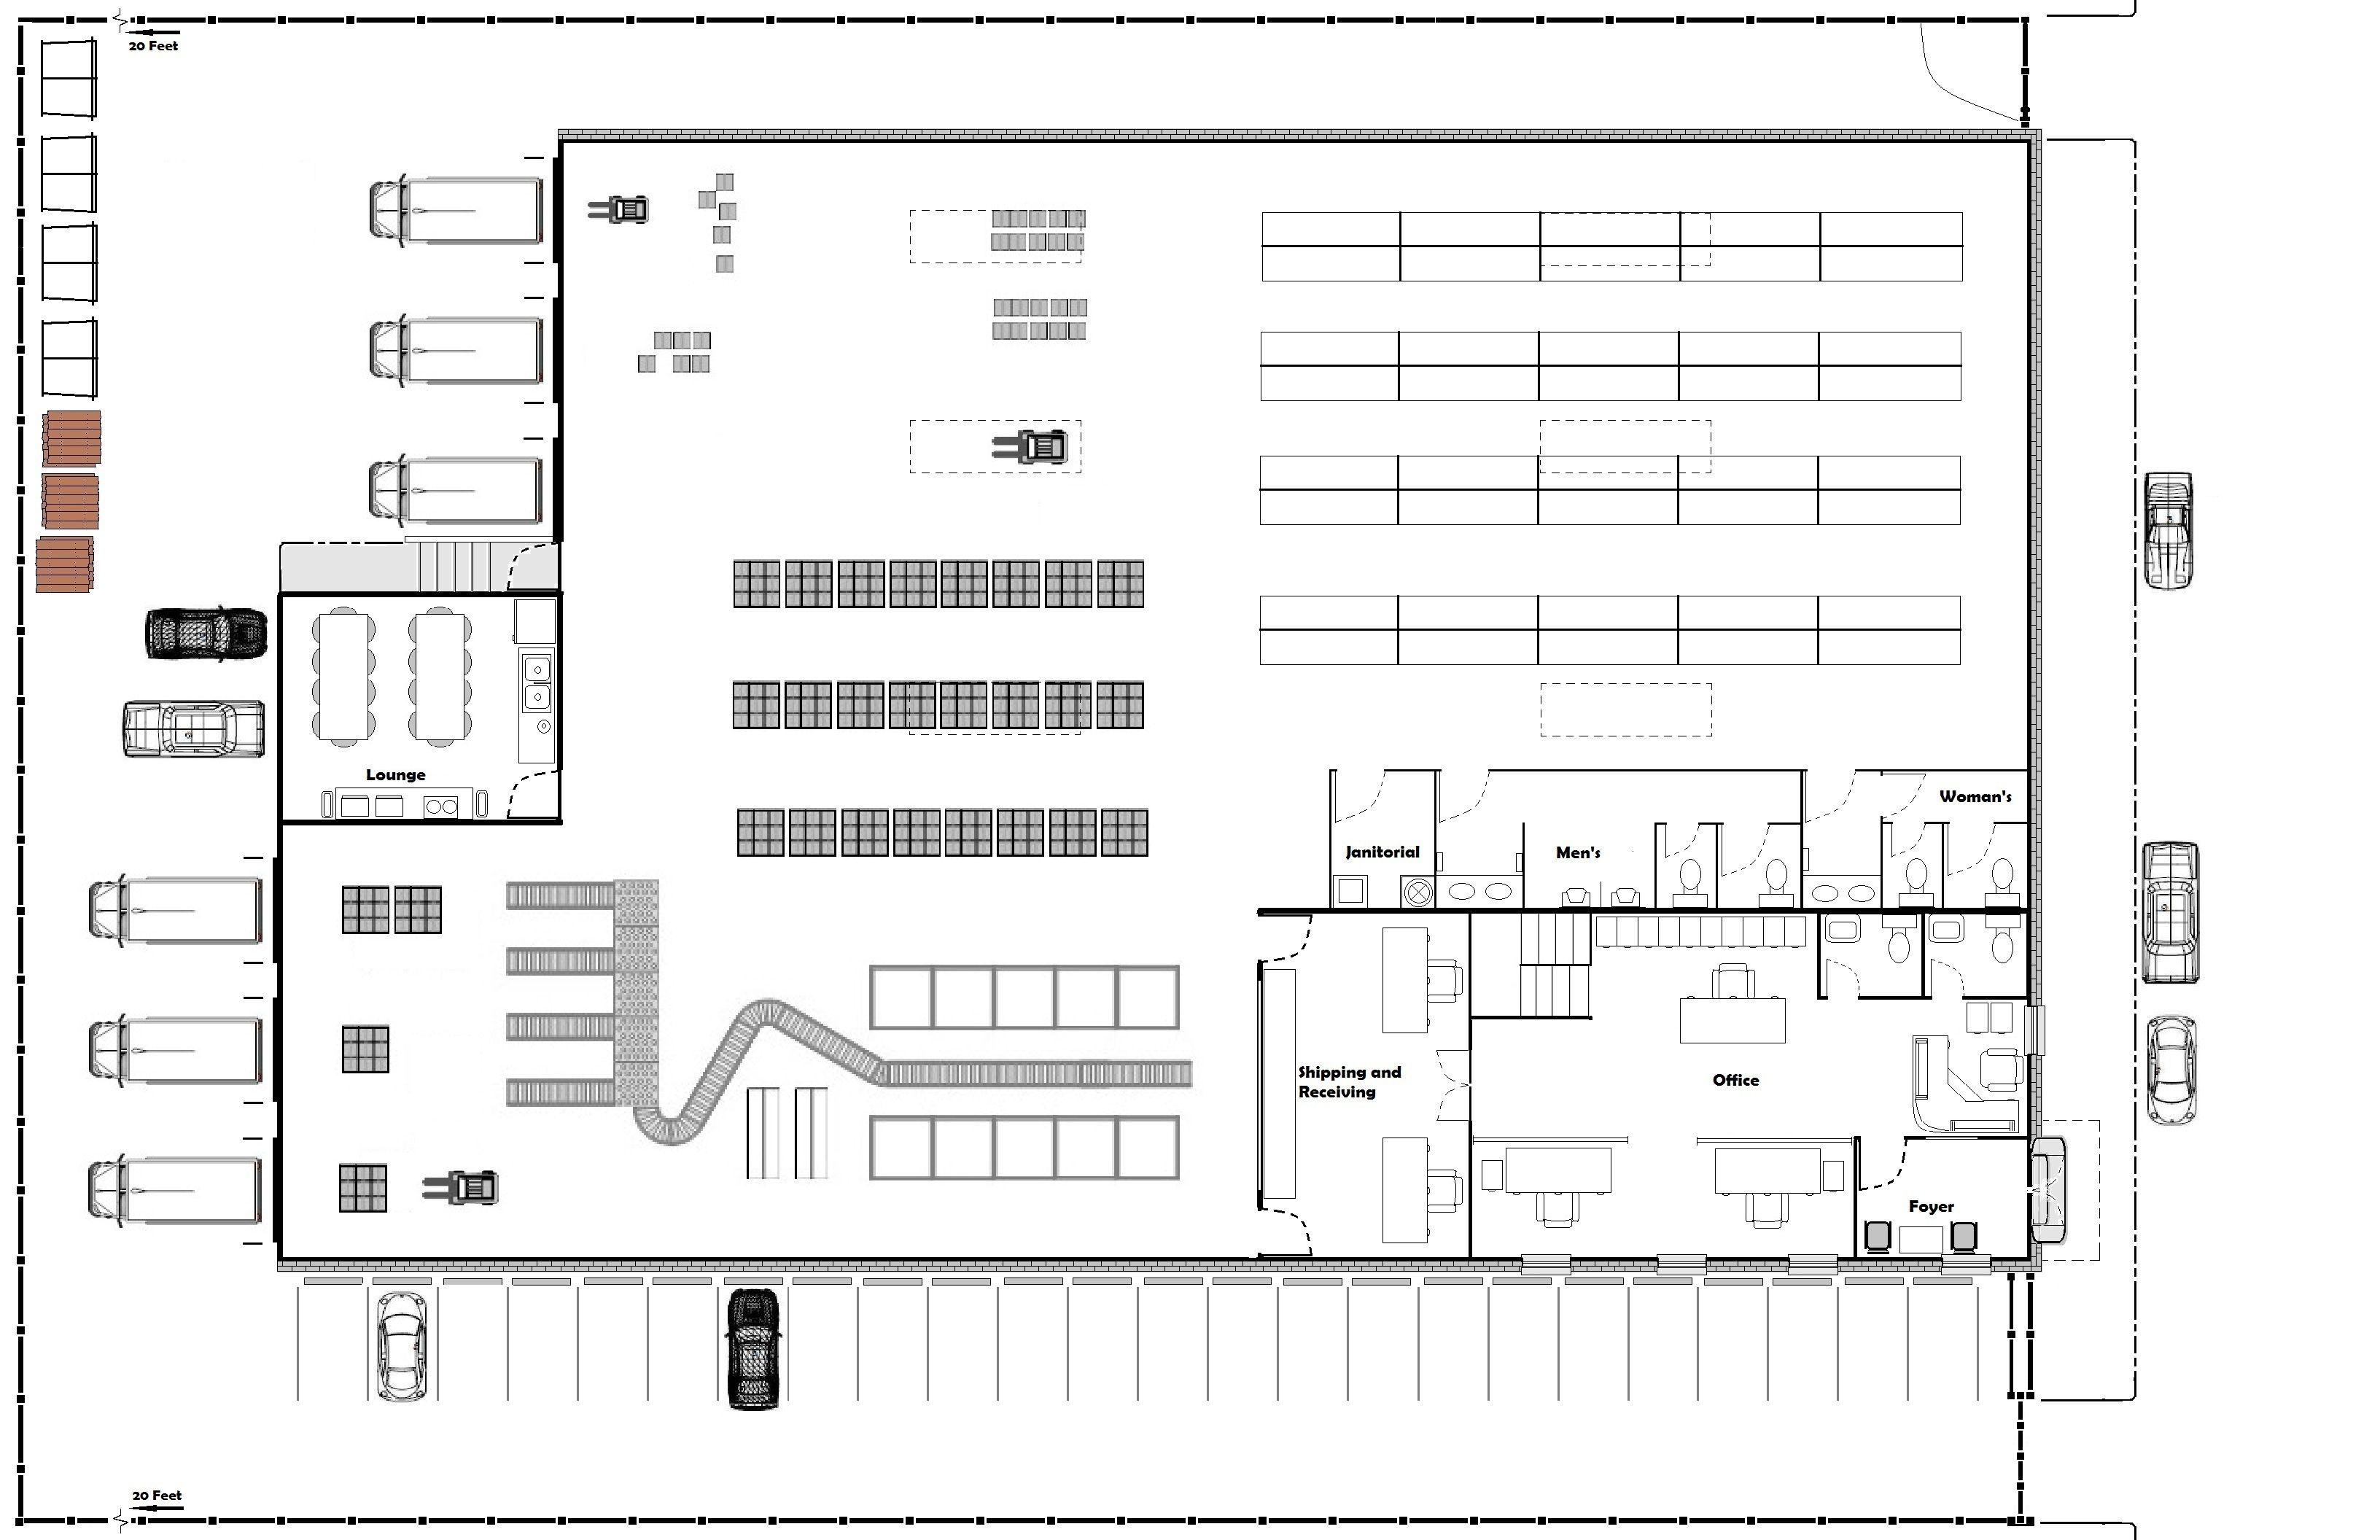 Floor Plan Of Warehouse - Google Search